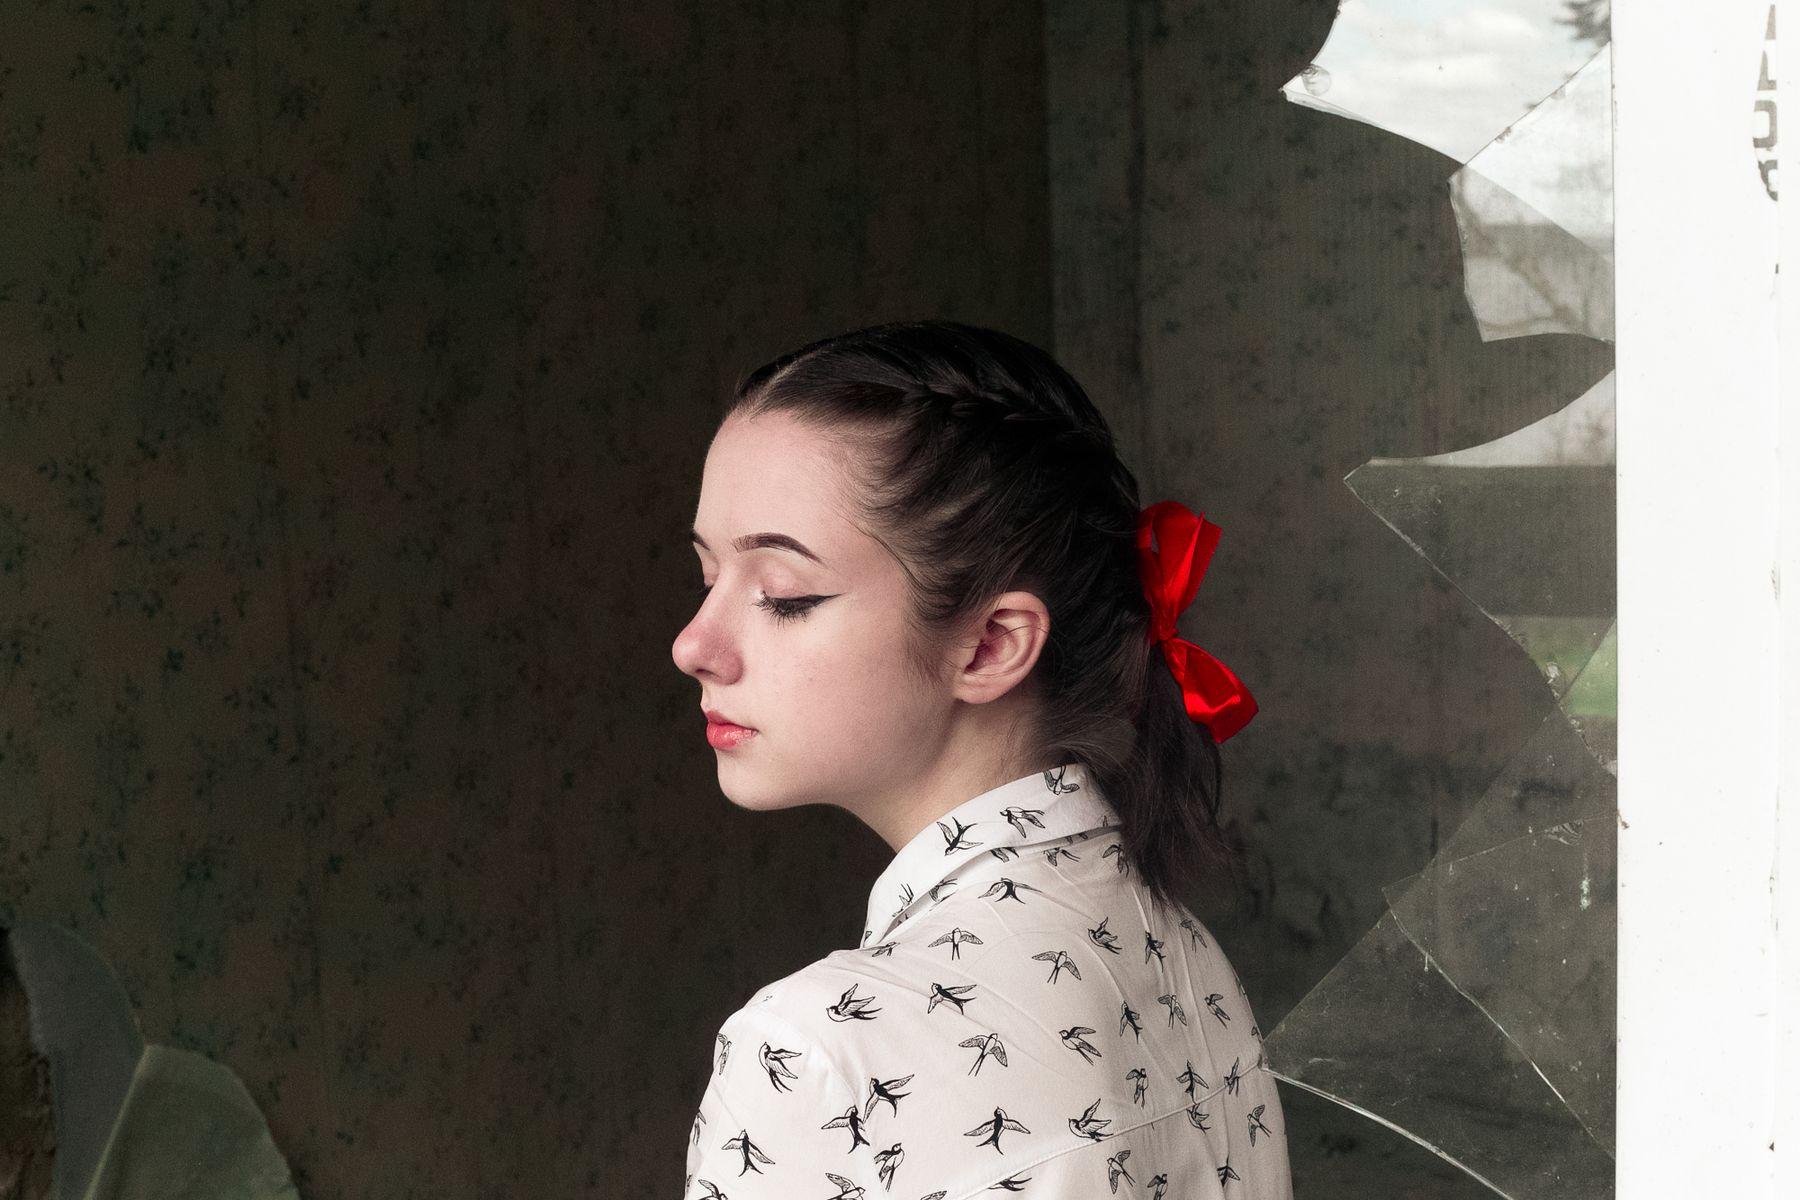 girl in red portrait